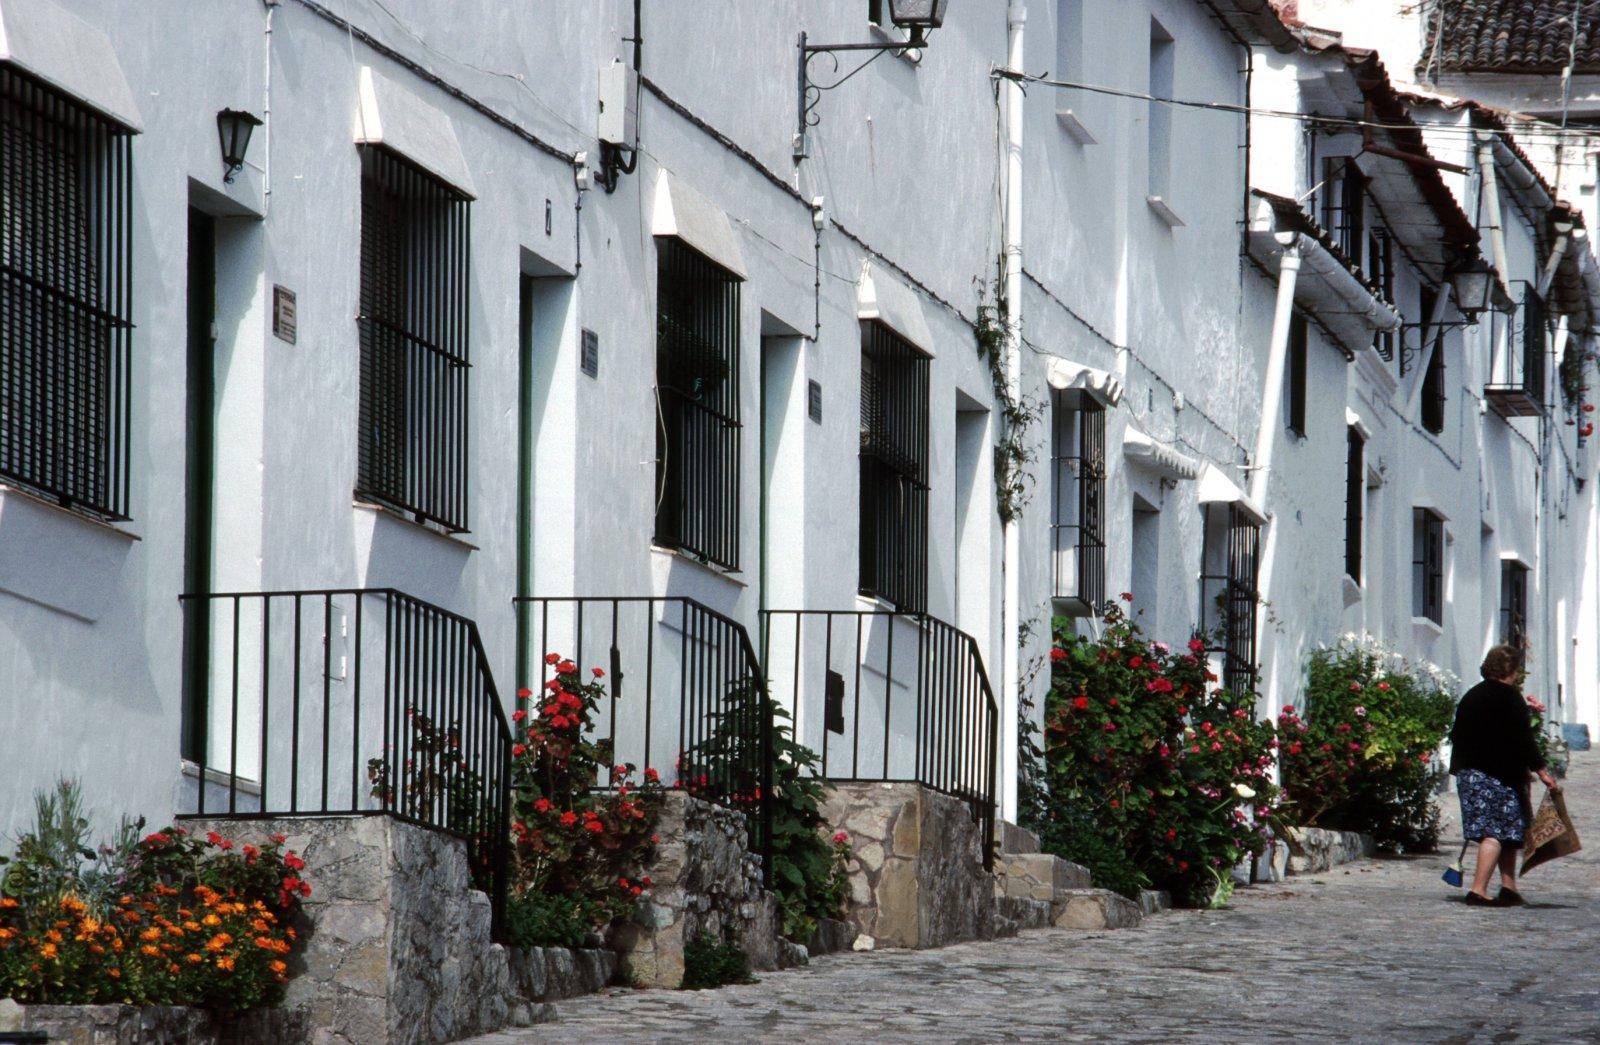 Street in Grazalema, Andalusia